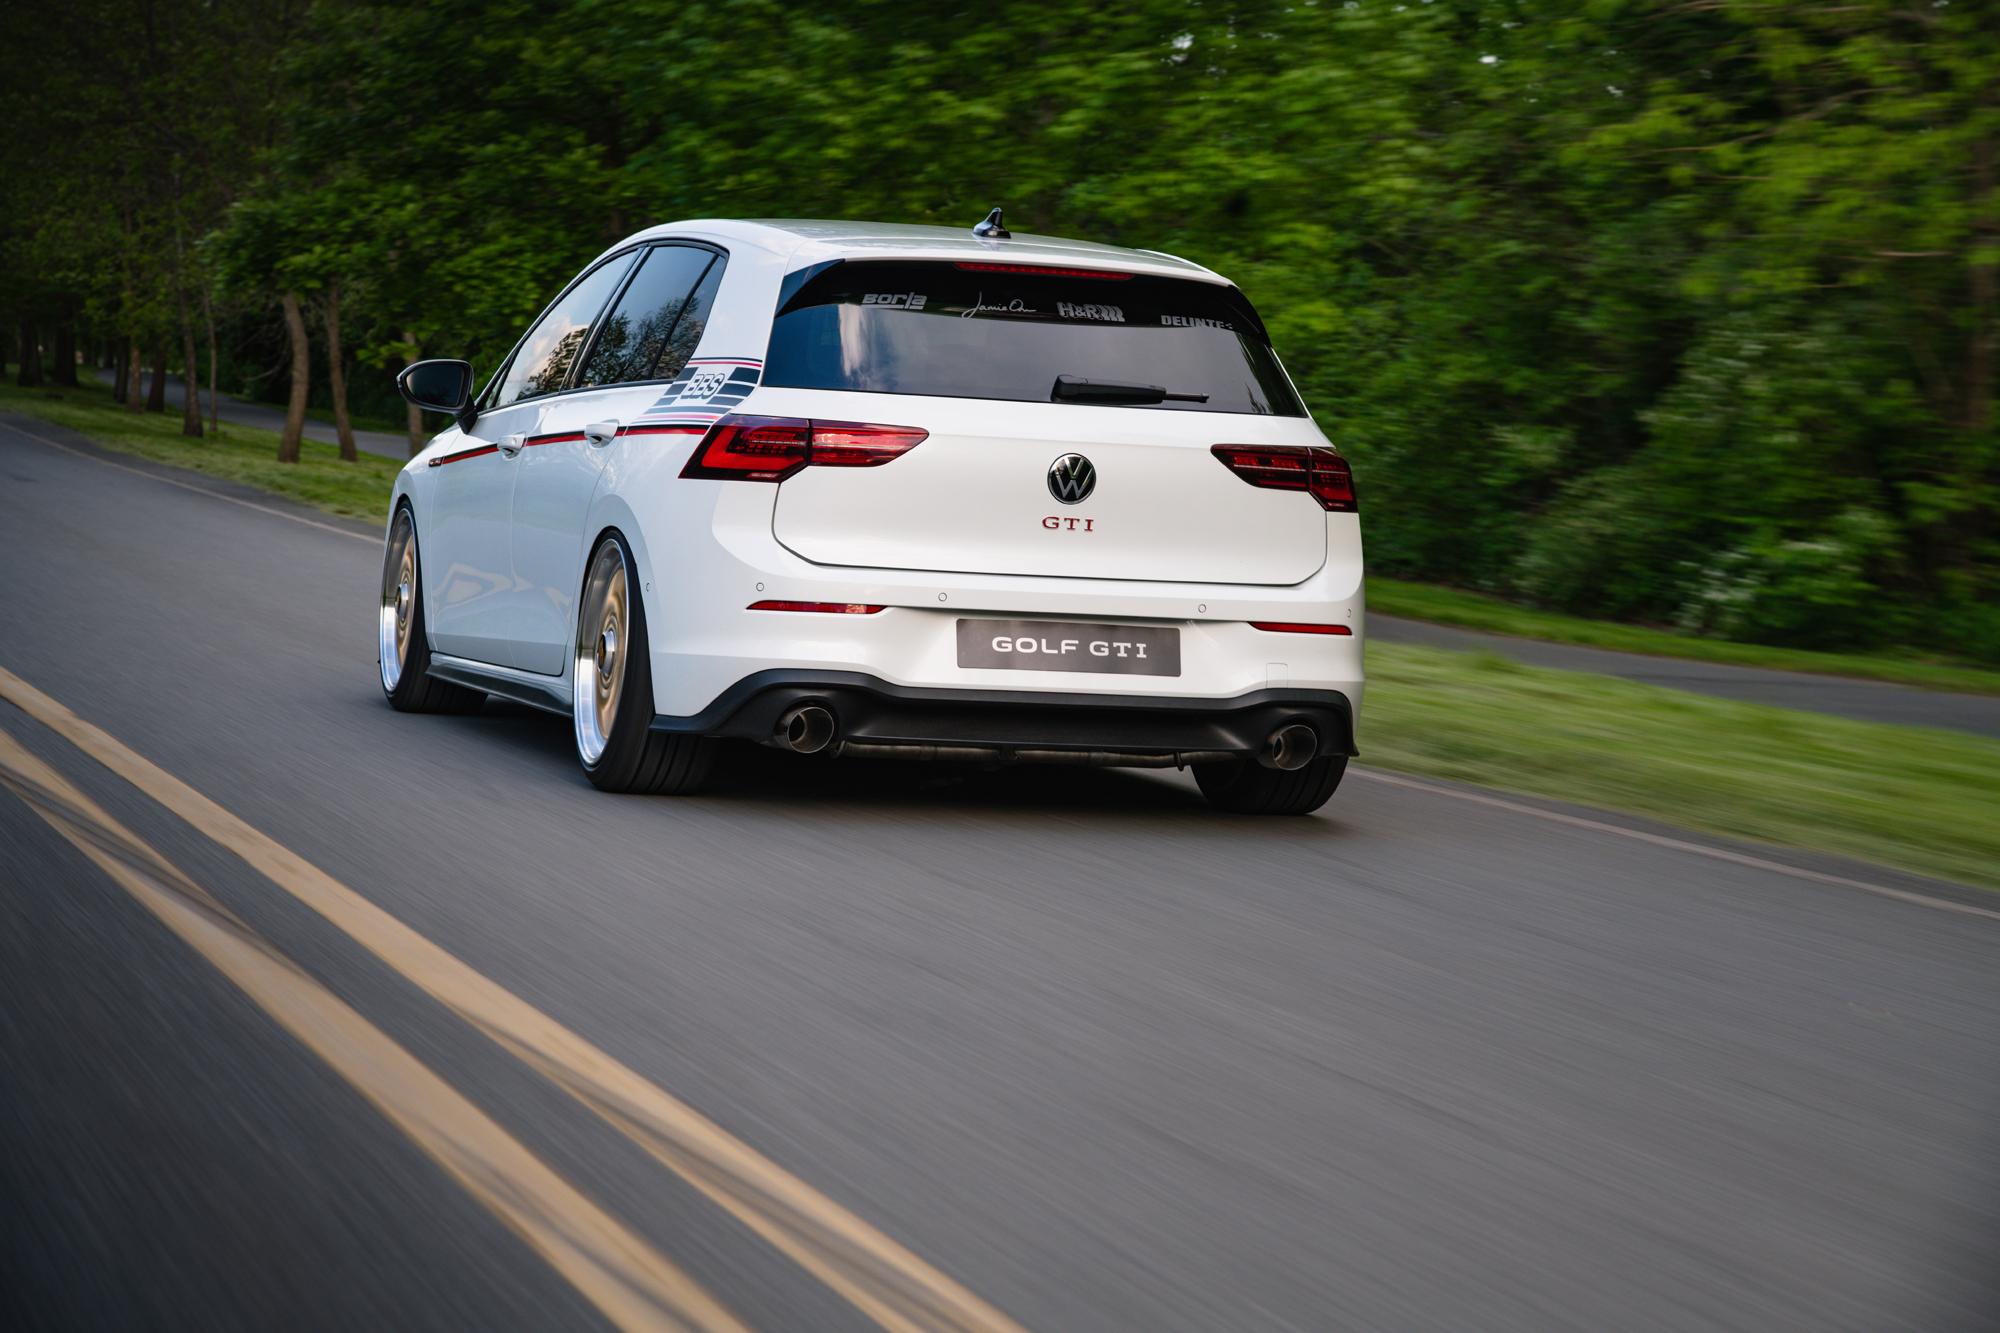 VW Golf GTi BBS concept rear 2